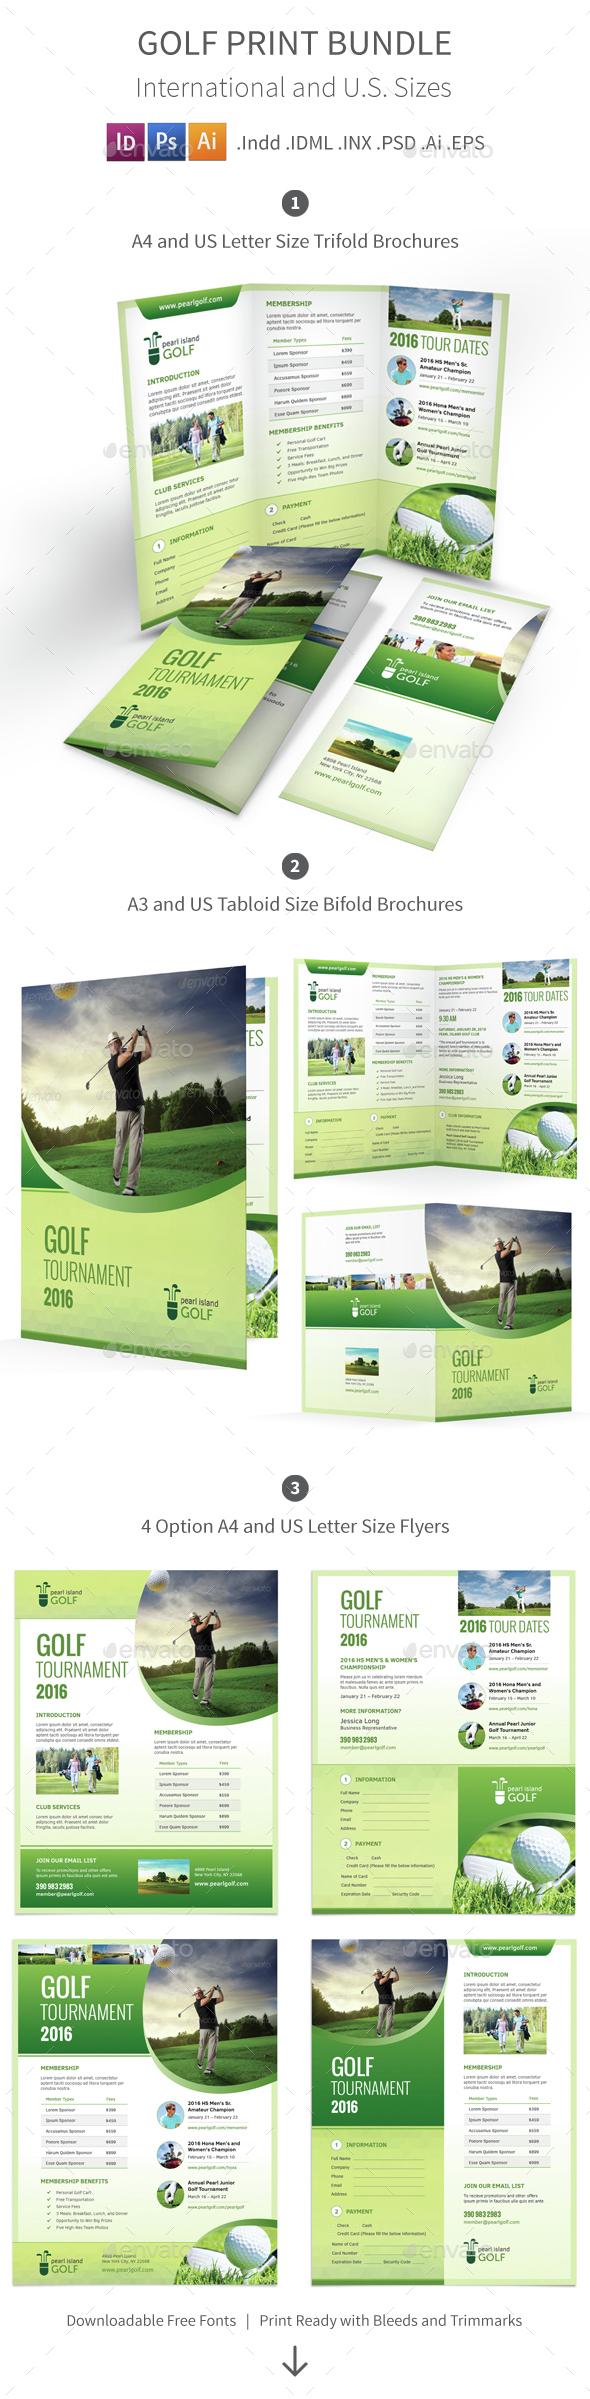 Golf Club Print Bundle - Informational Brochures